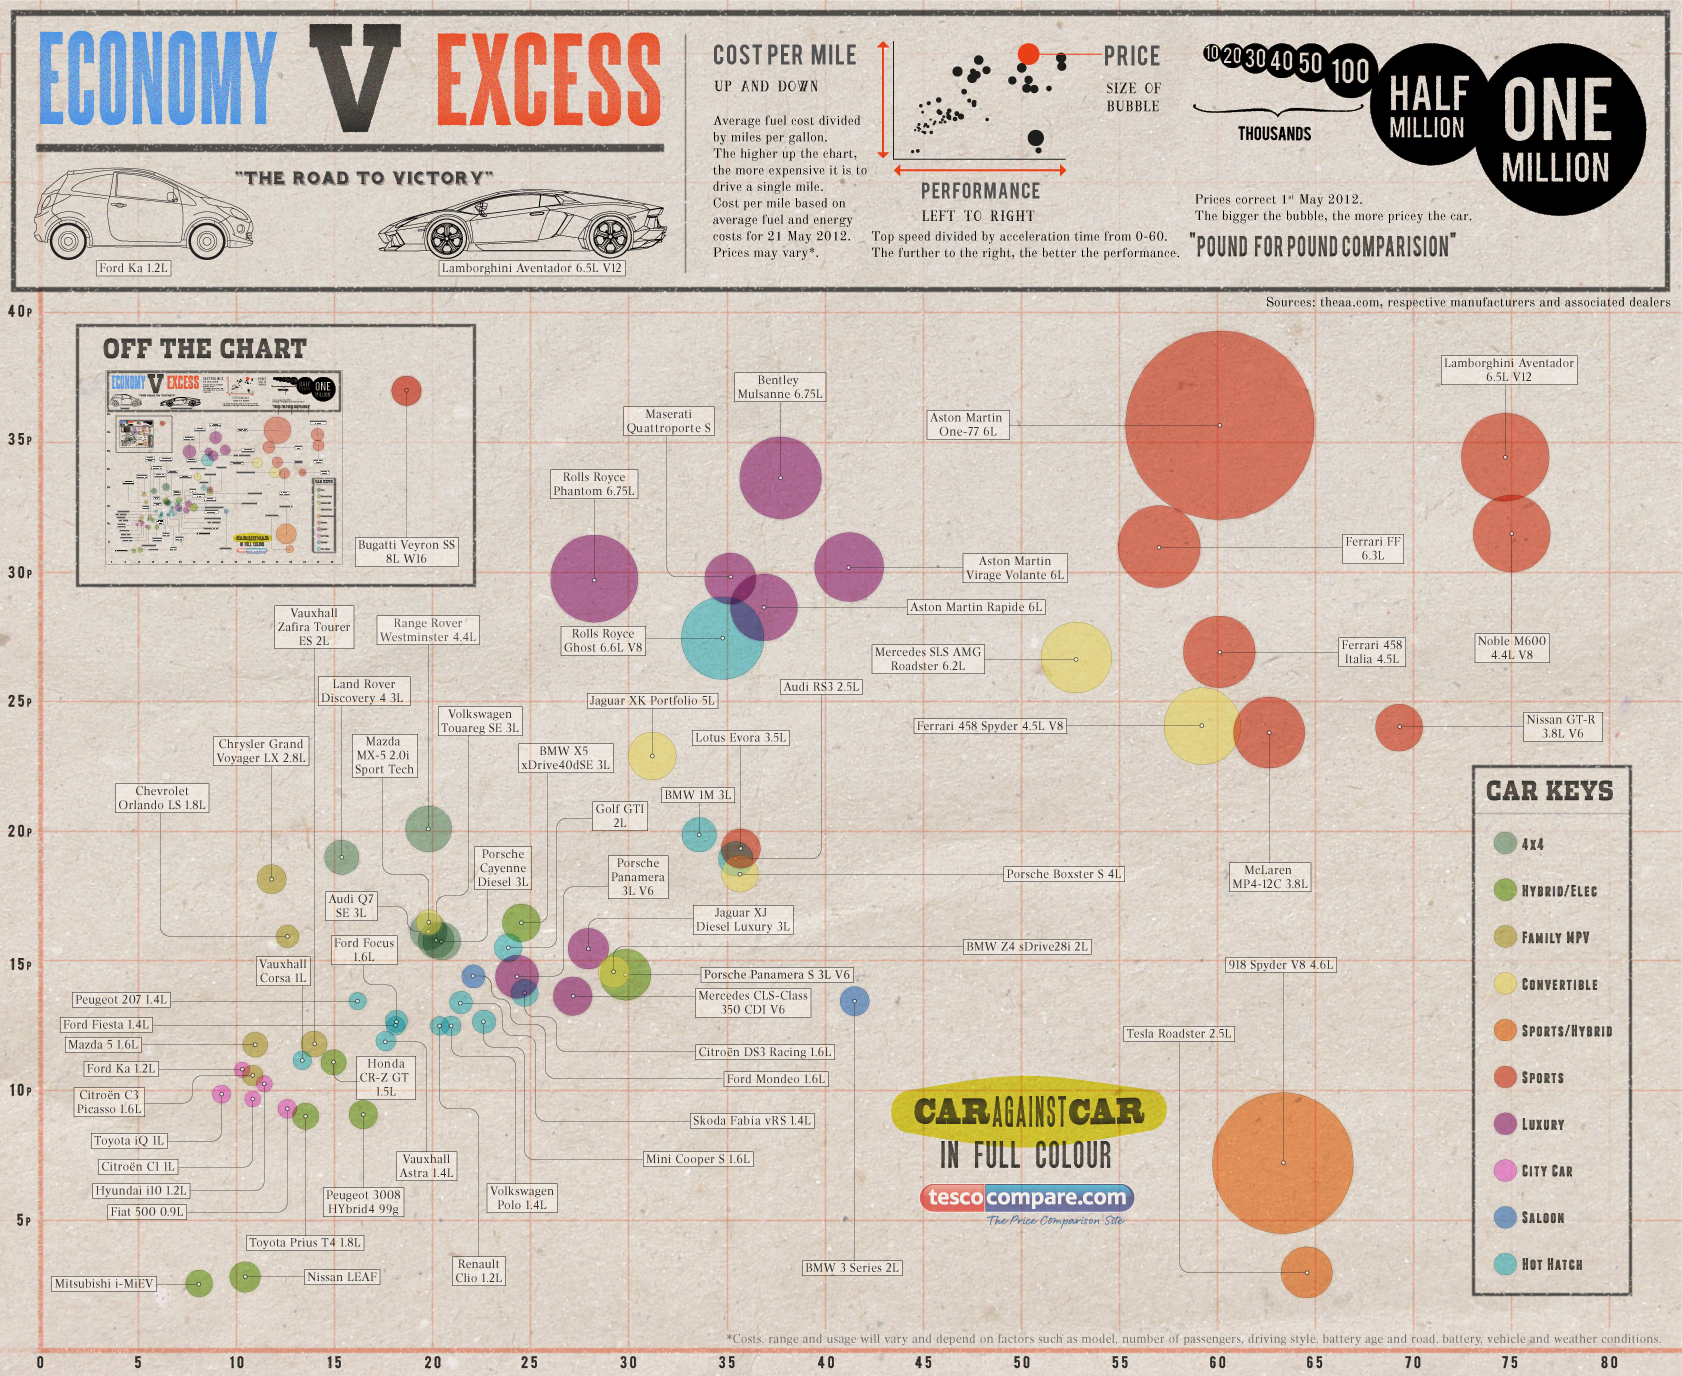 economy-v-excess_5033a87dd0636